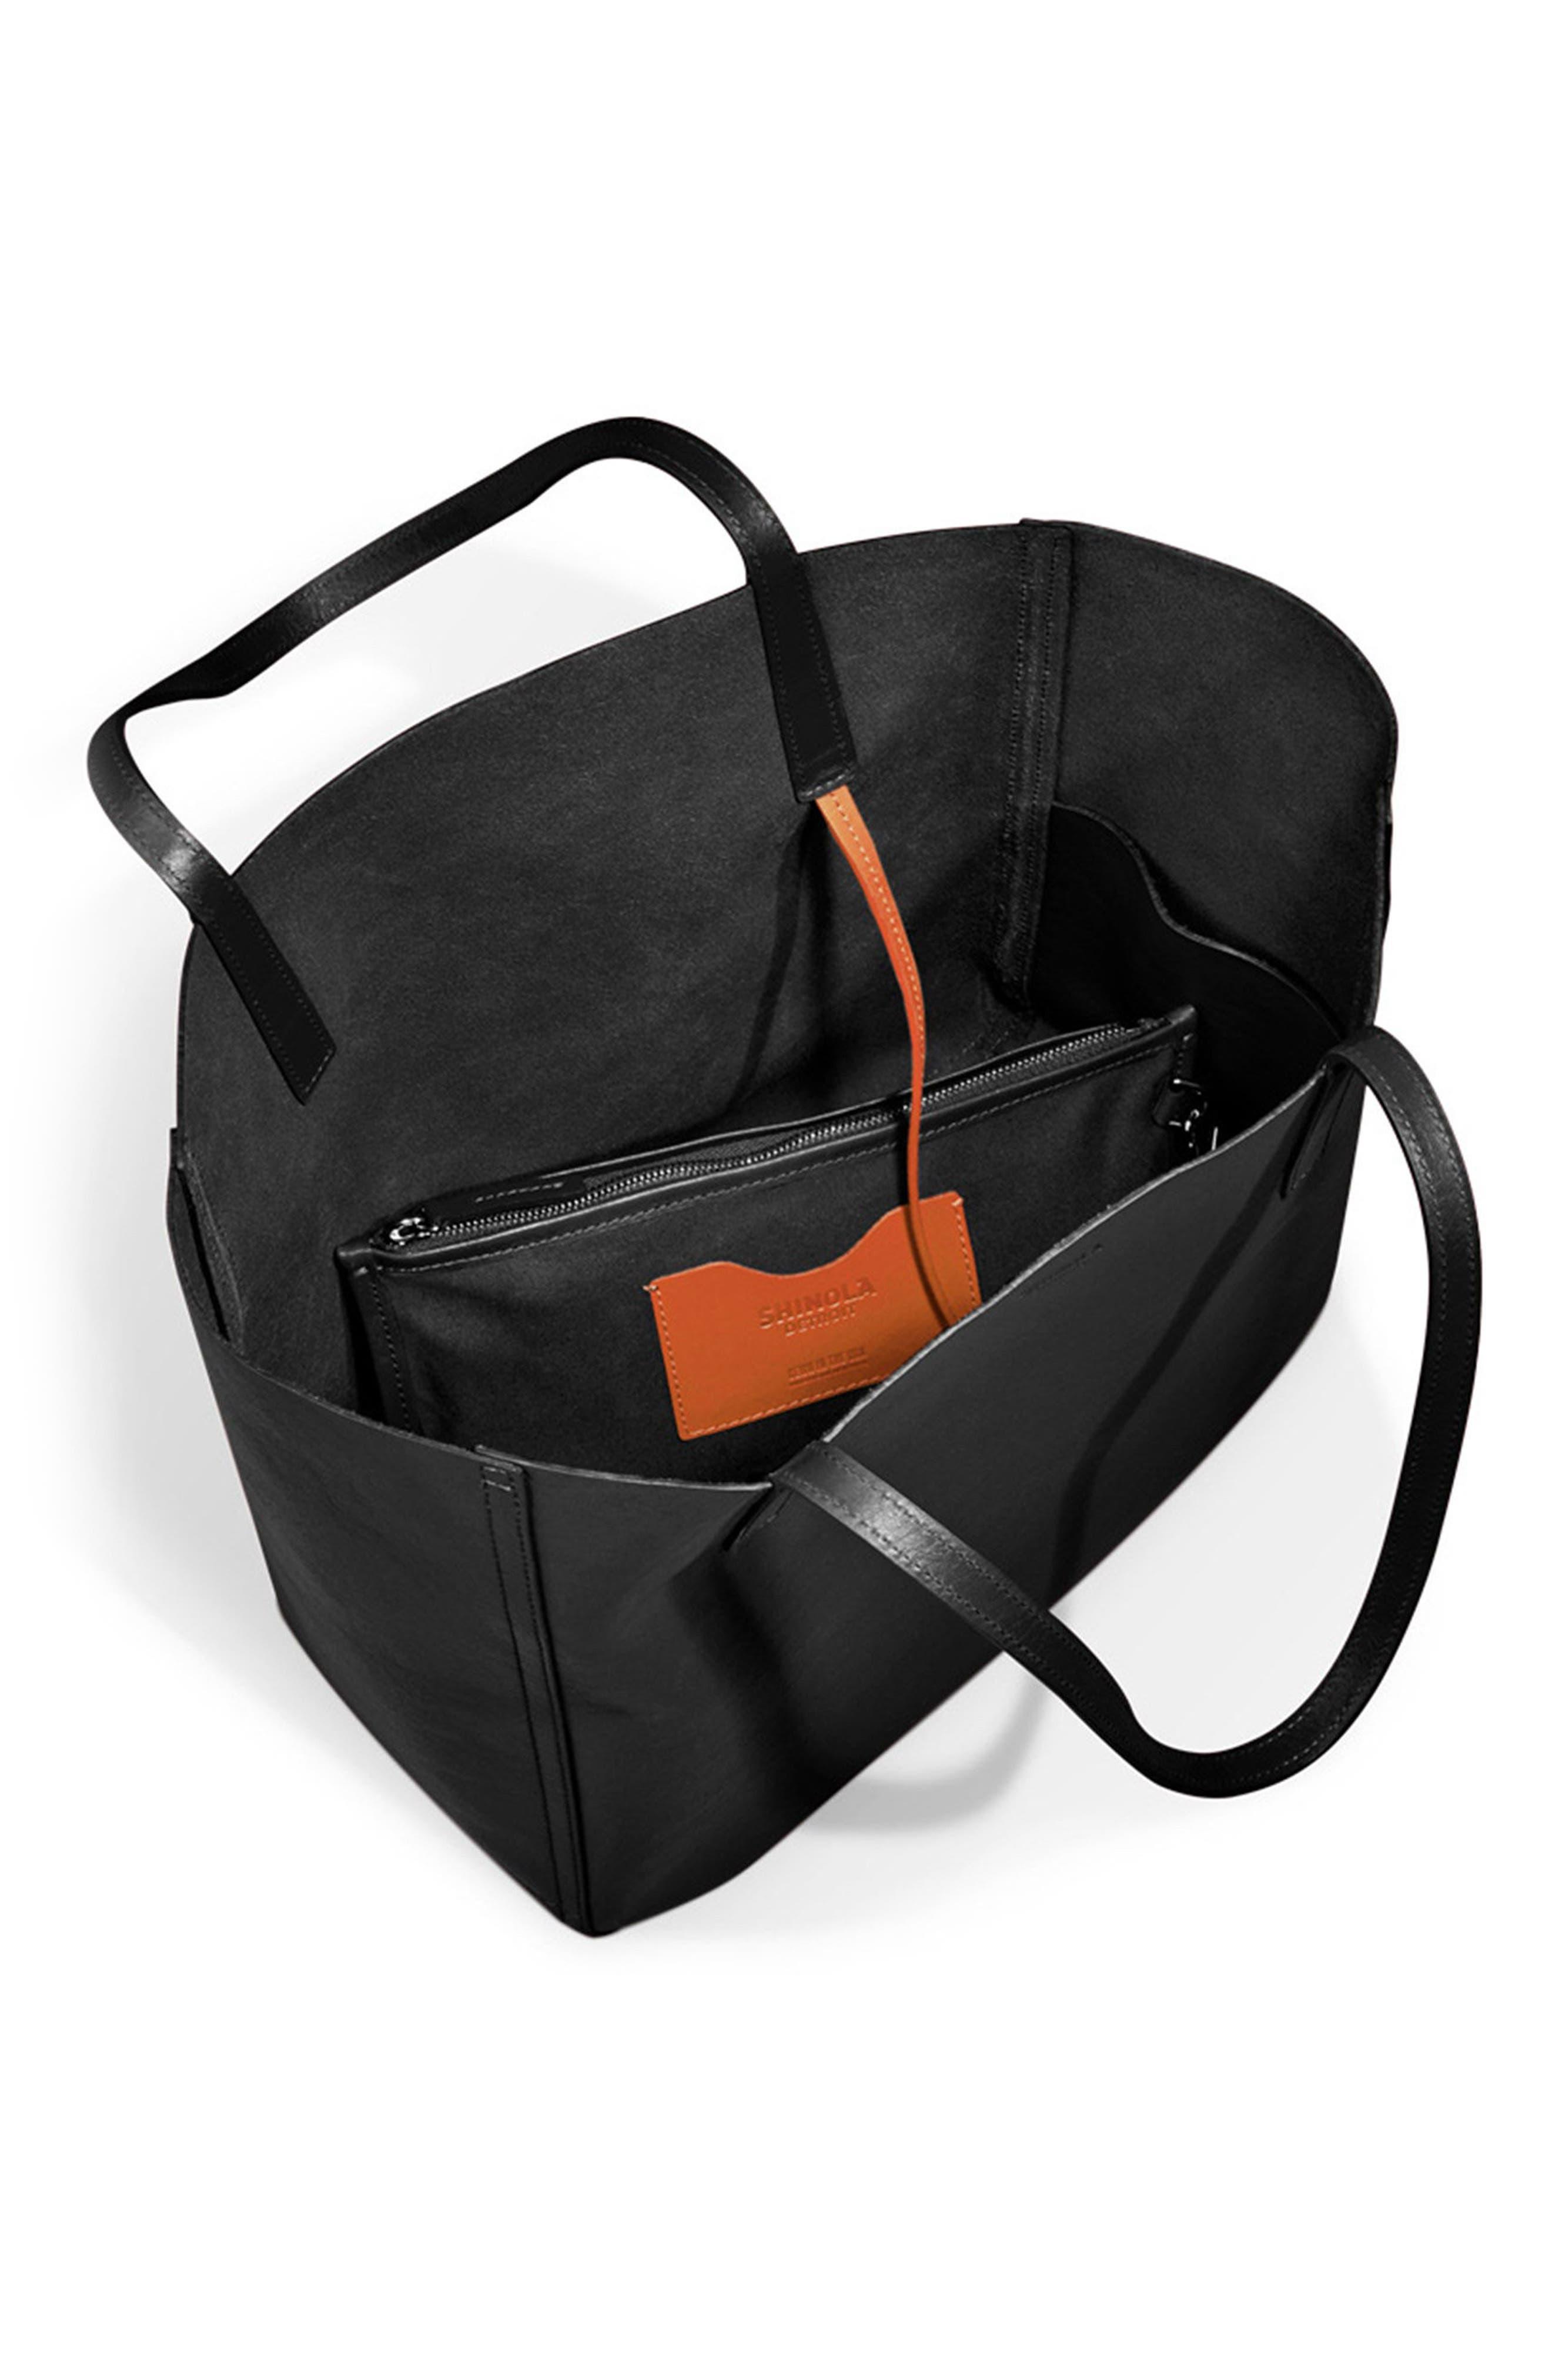 Medium Leather Shopper,                             Alternate thumbnail 3, color,                             Black